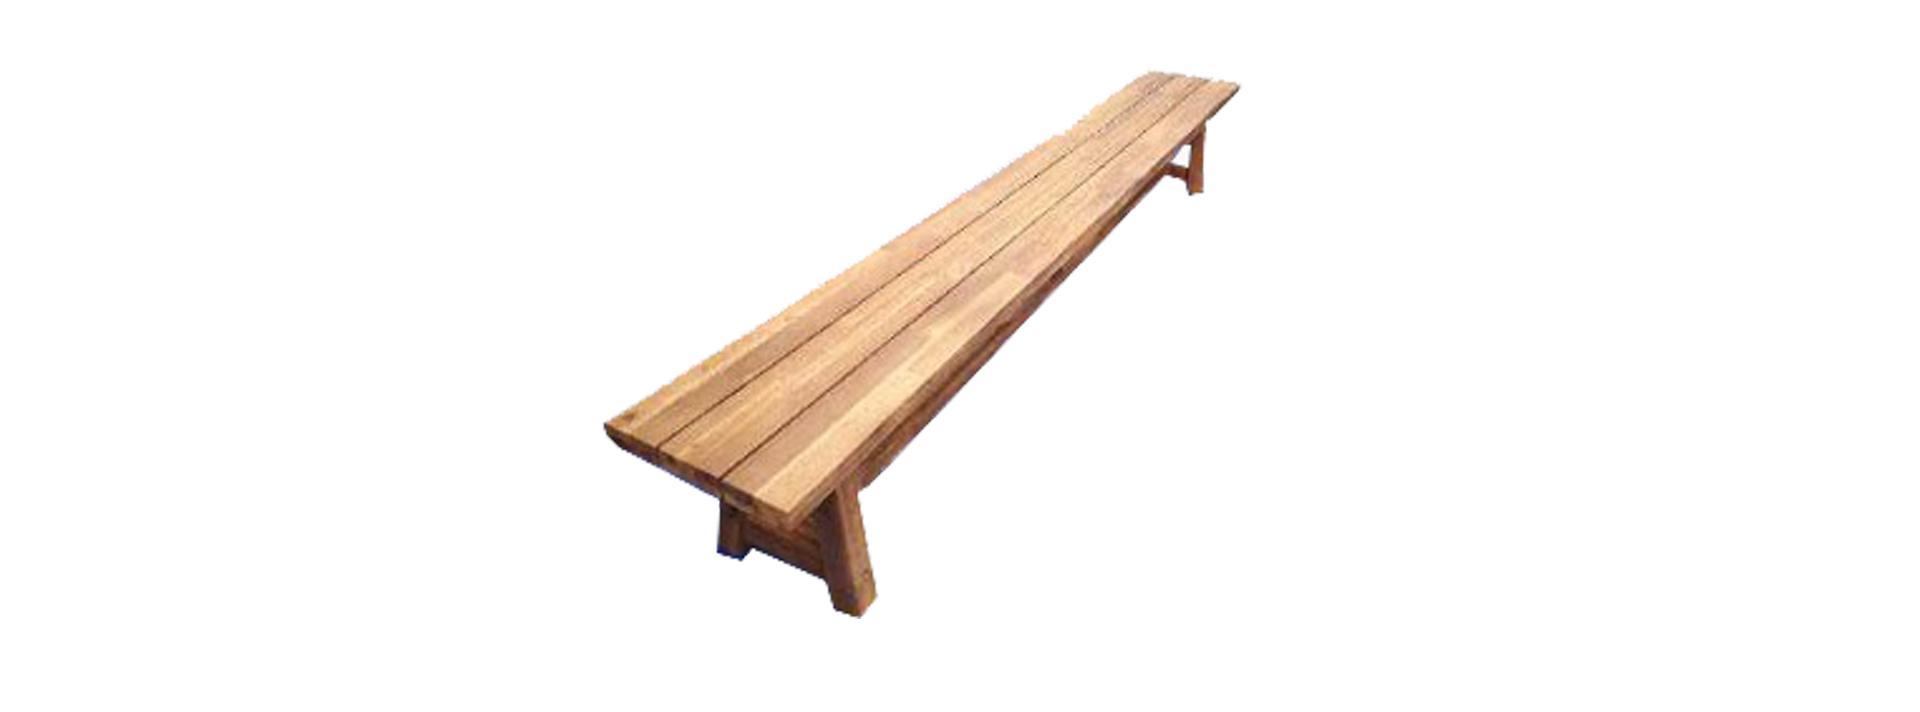 Antigua bench 300x40x45 cm